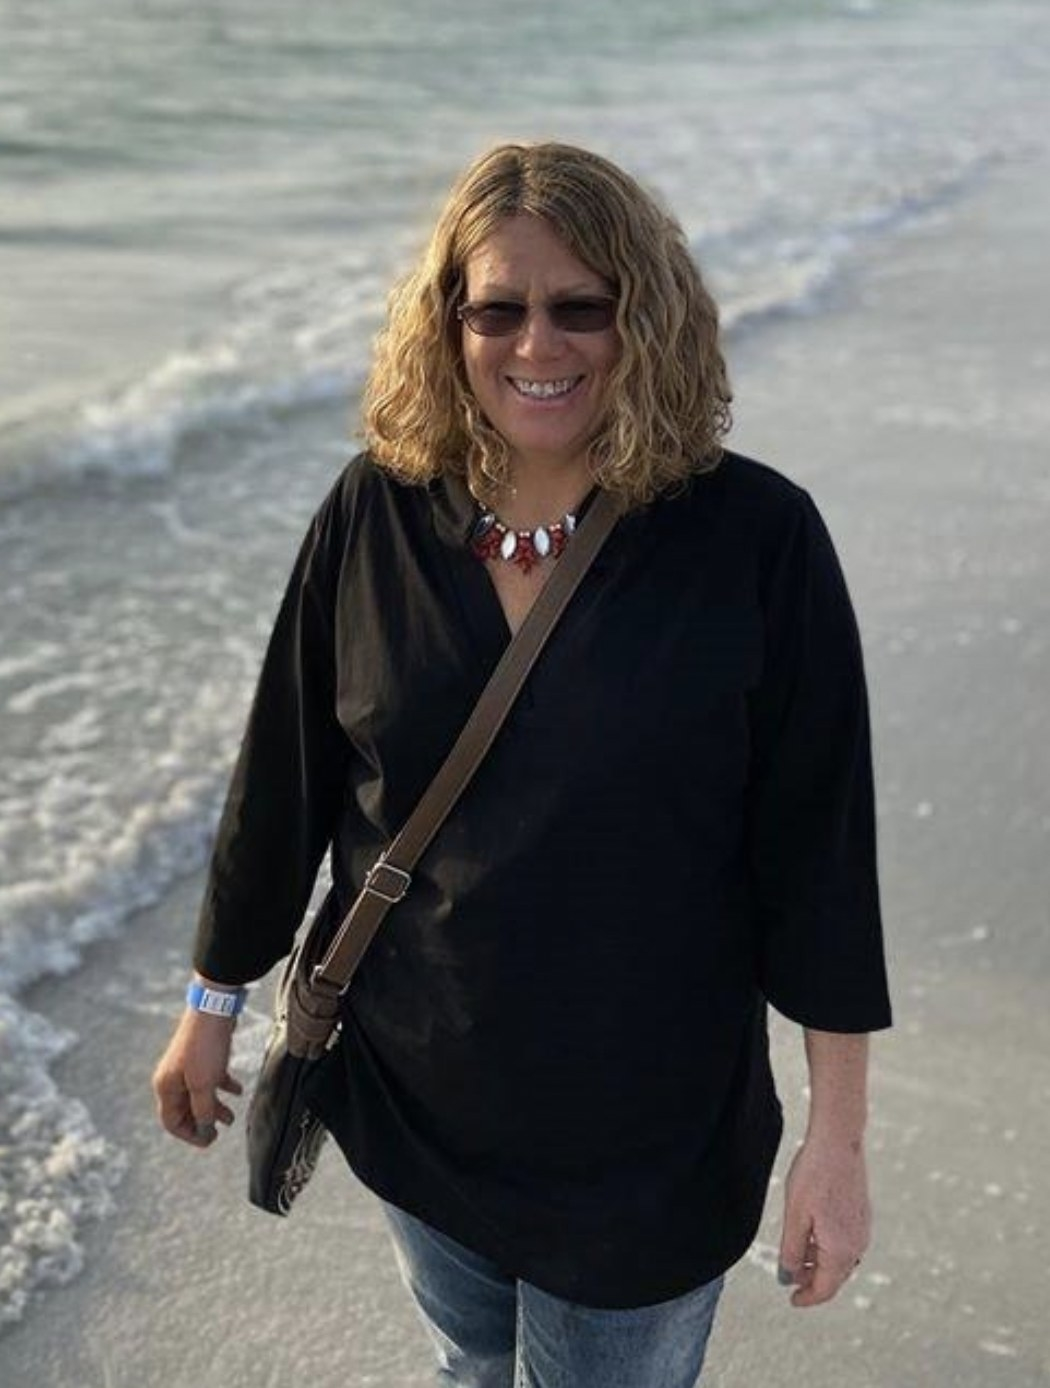 a person walking on a beach wearing a black tunic shirt